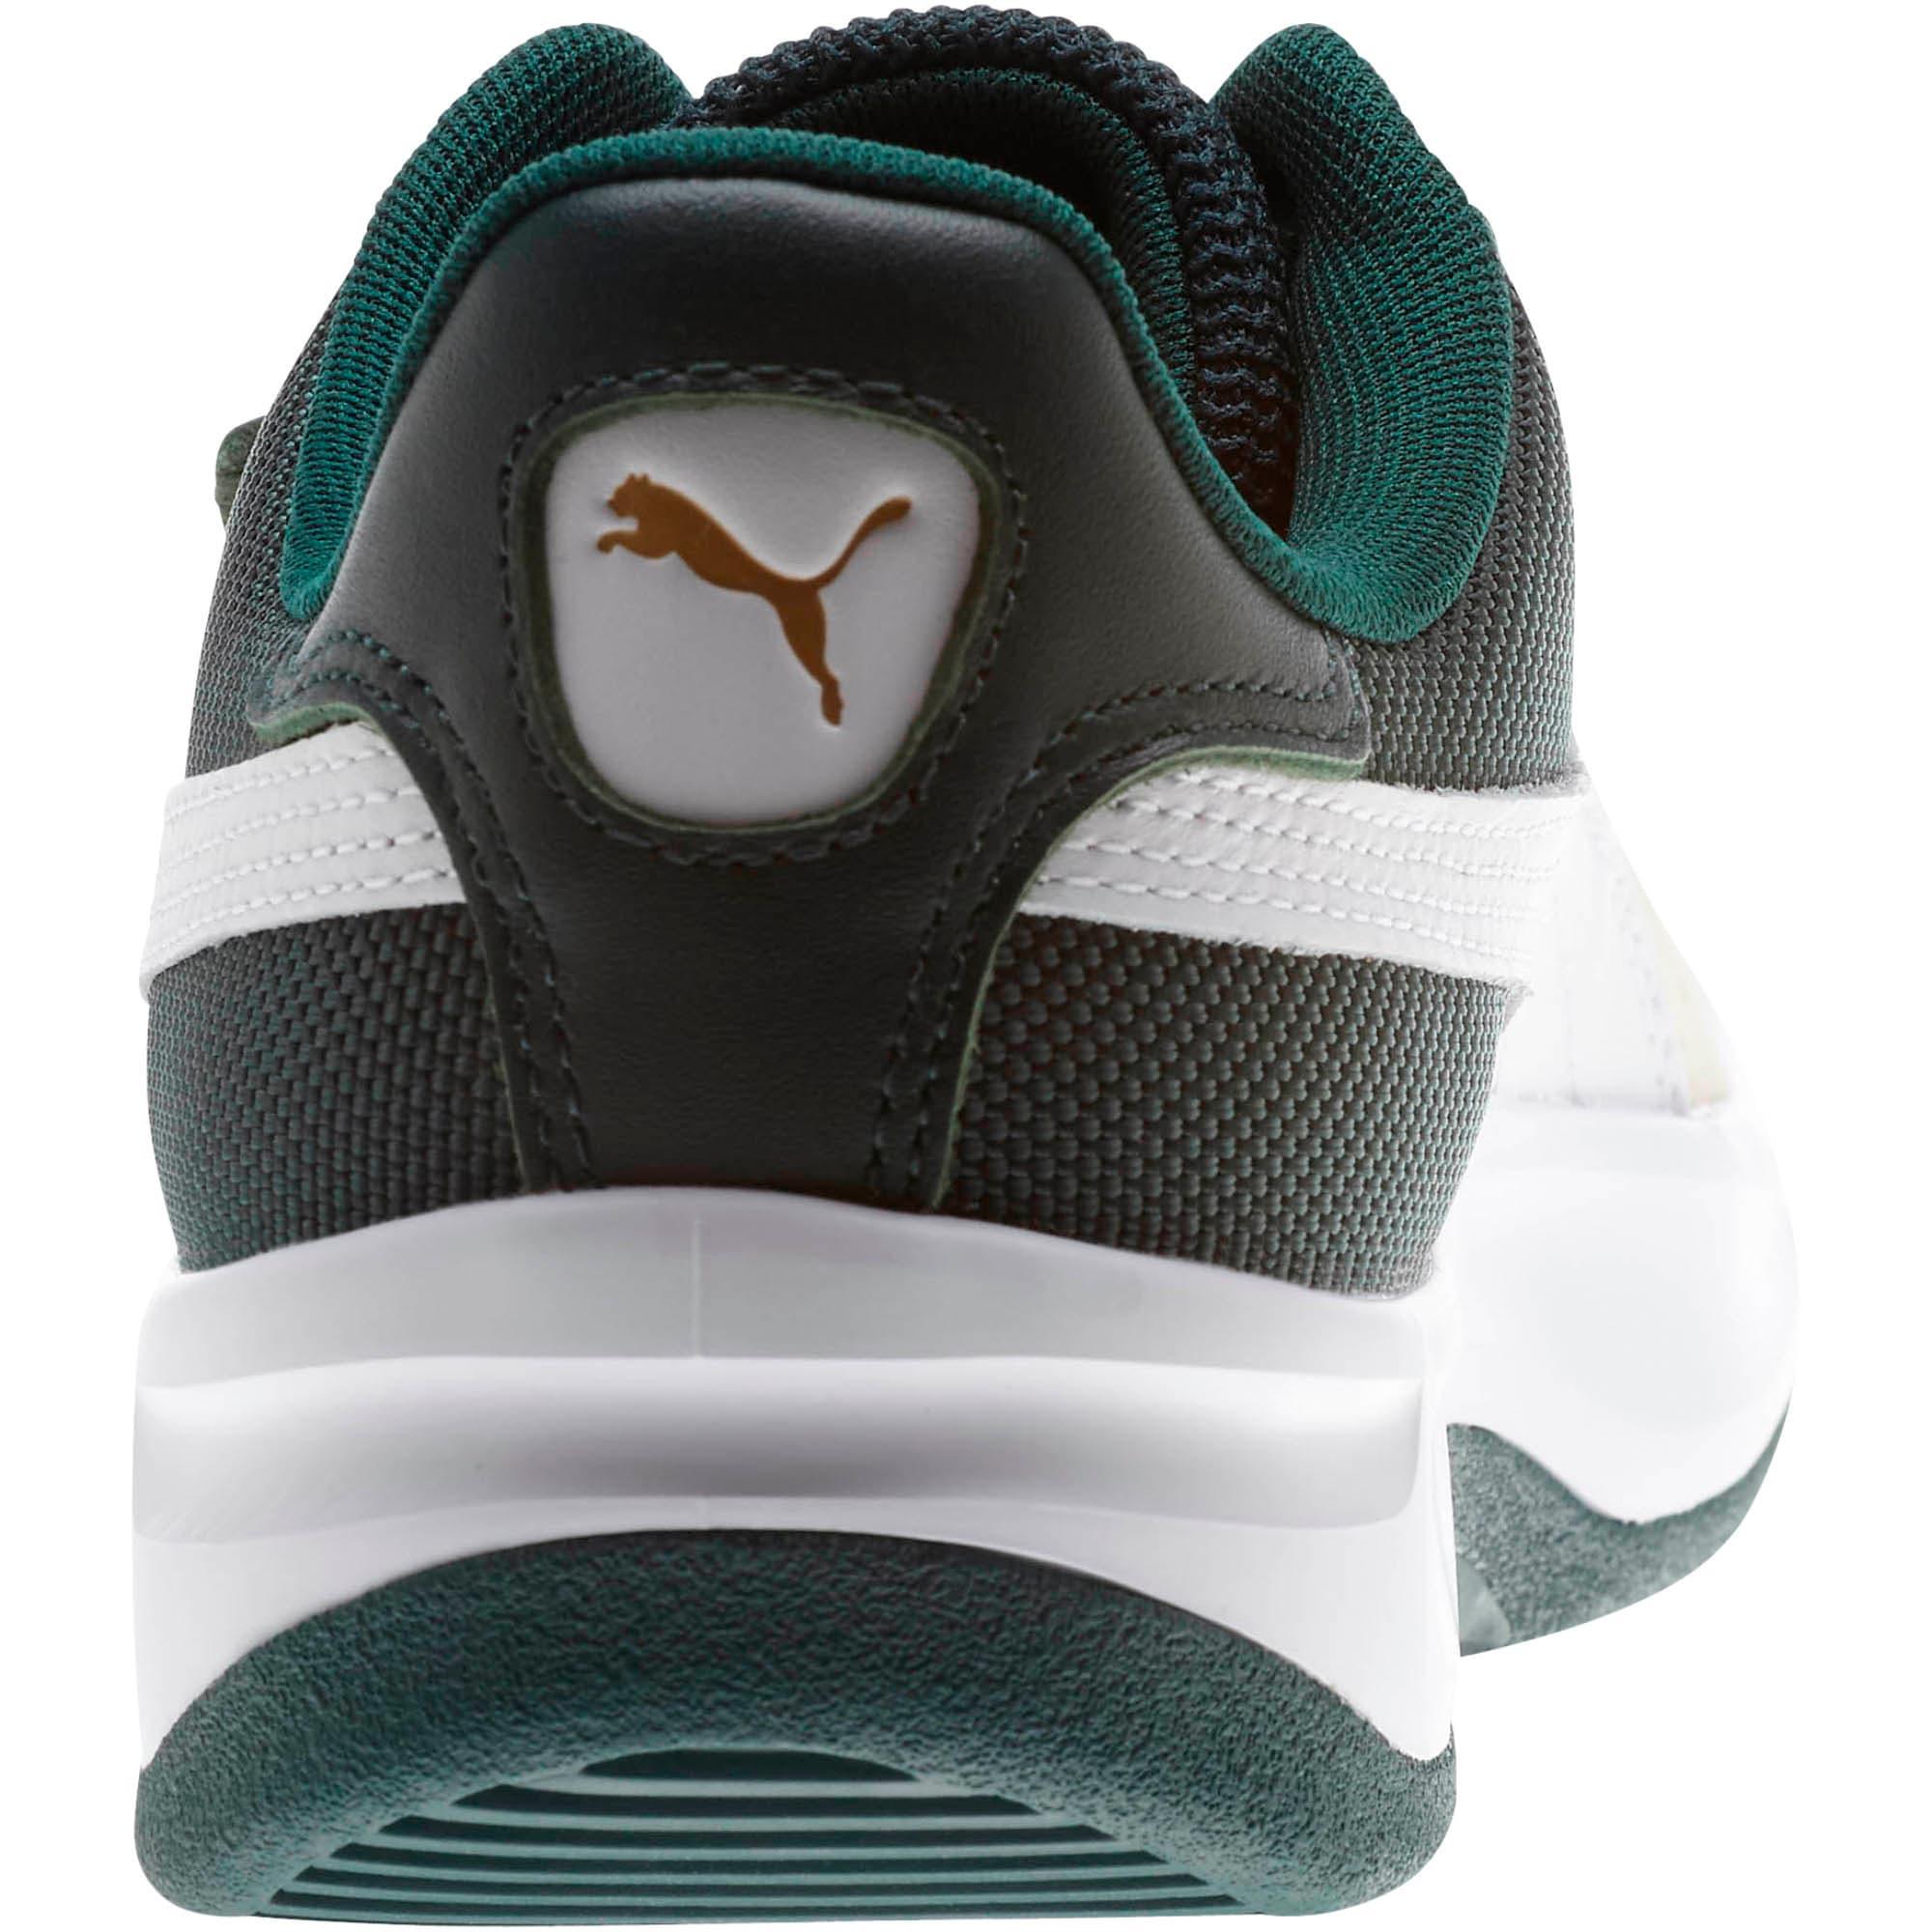 Thumbnail 3 of California Sneakers, WhsprWht-PonderosaPin-PumWht, medium